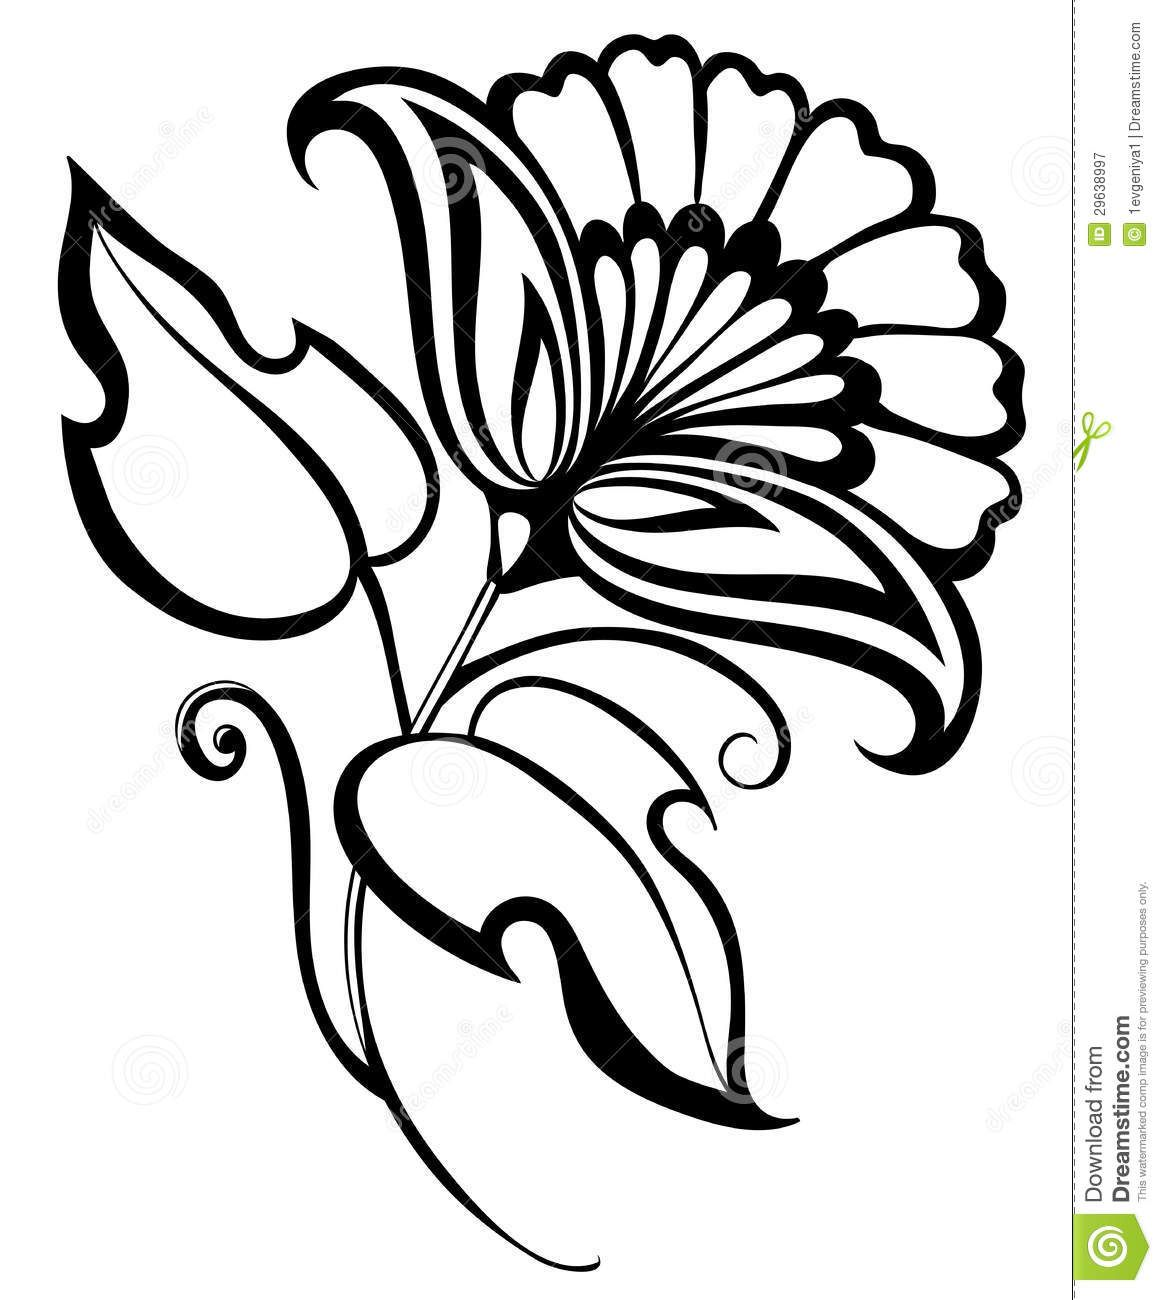 1162x1300 Arts Crafts Henna Tattoo Designs